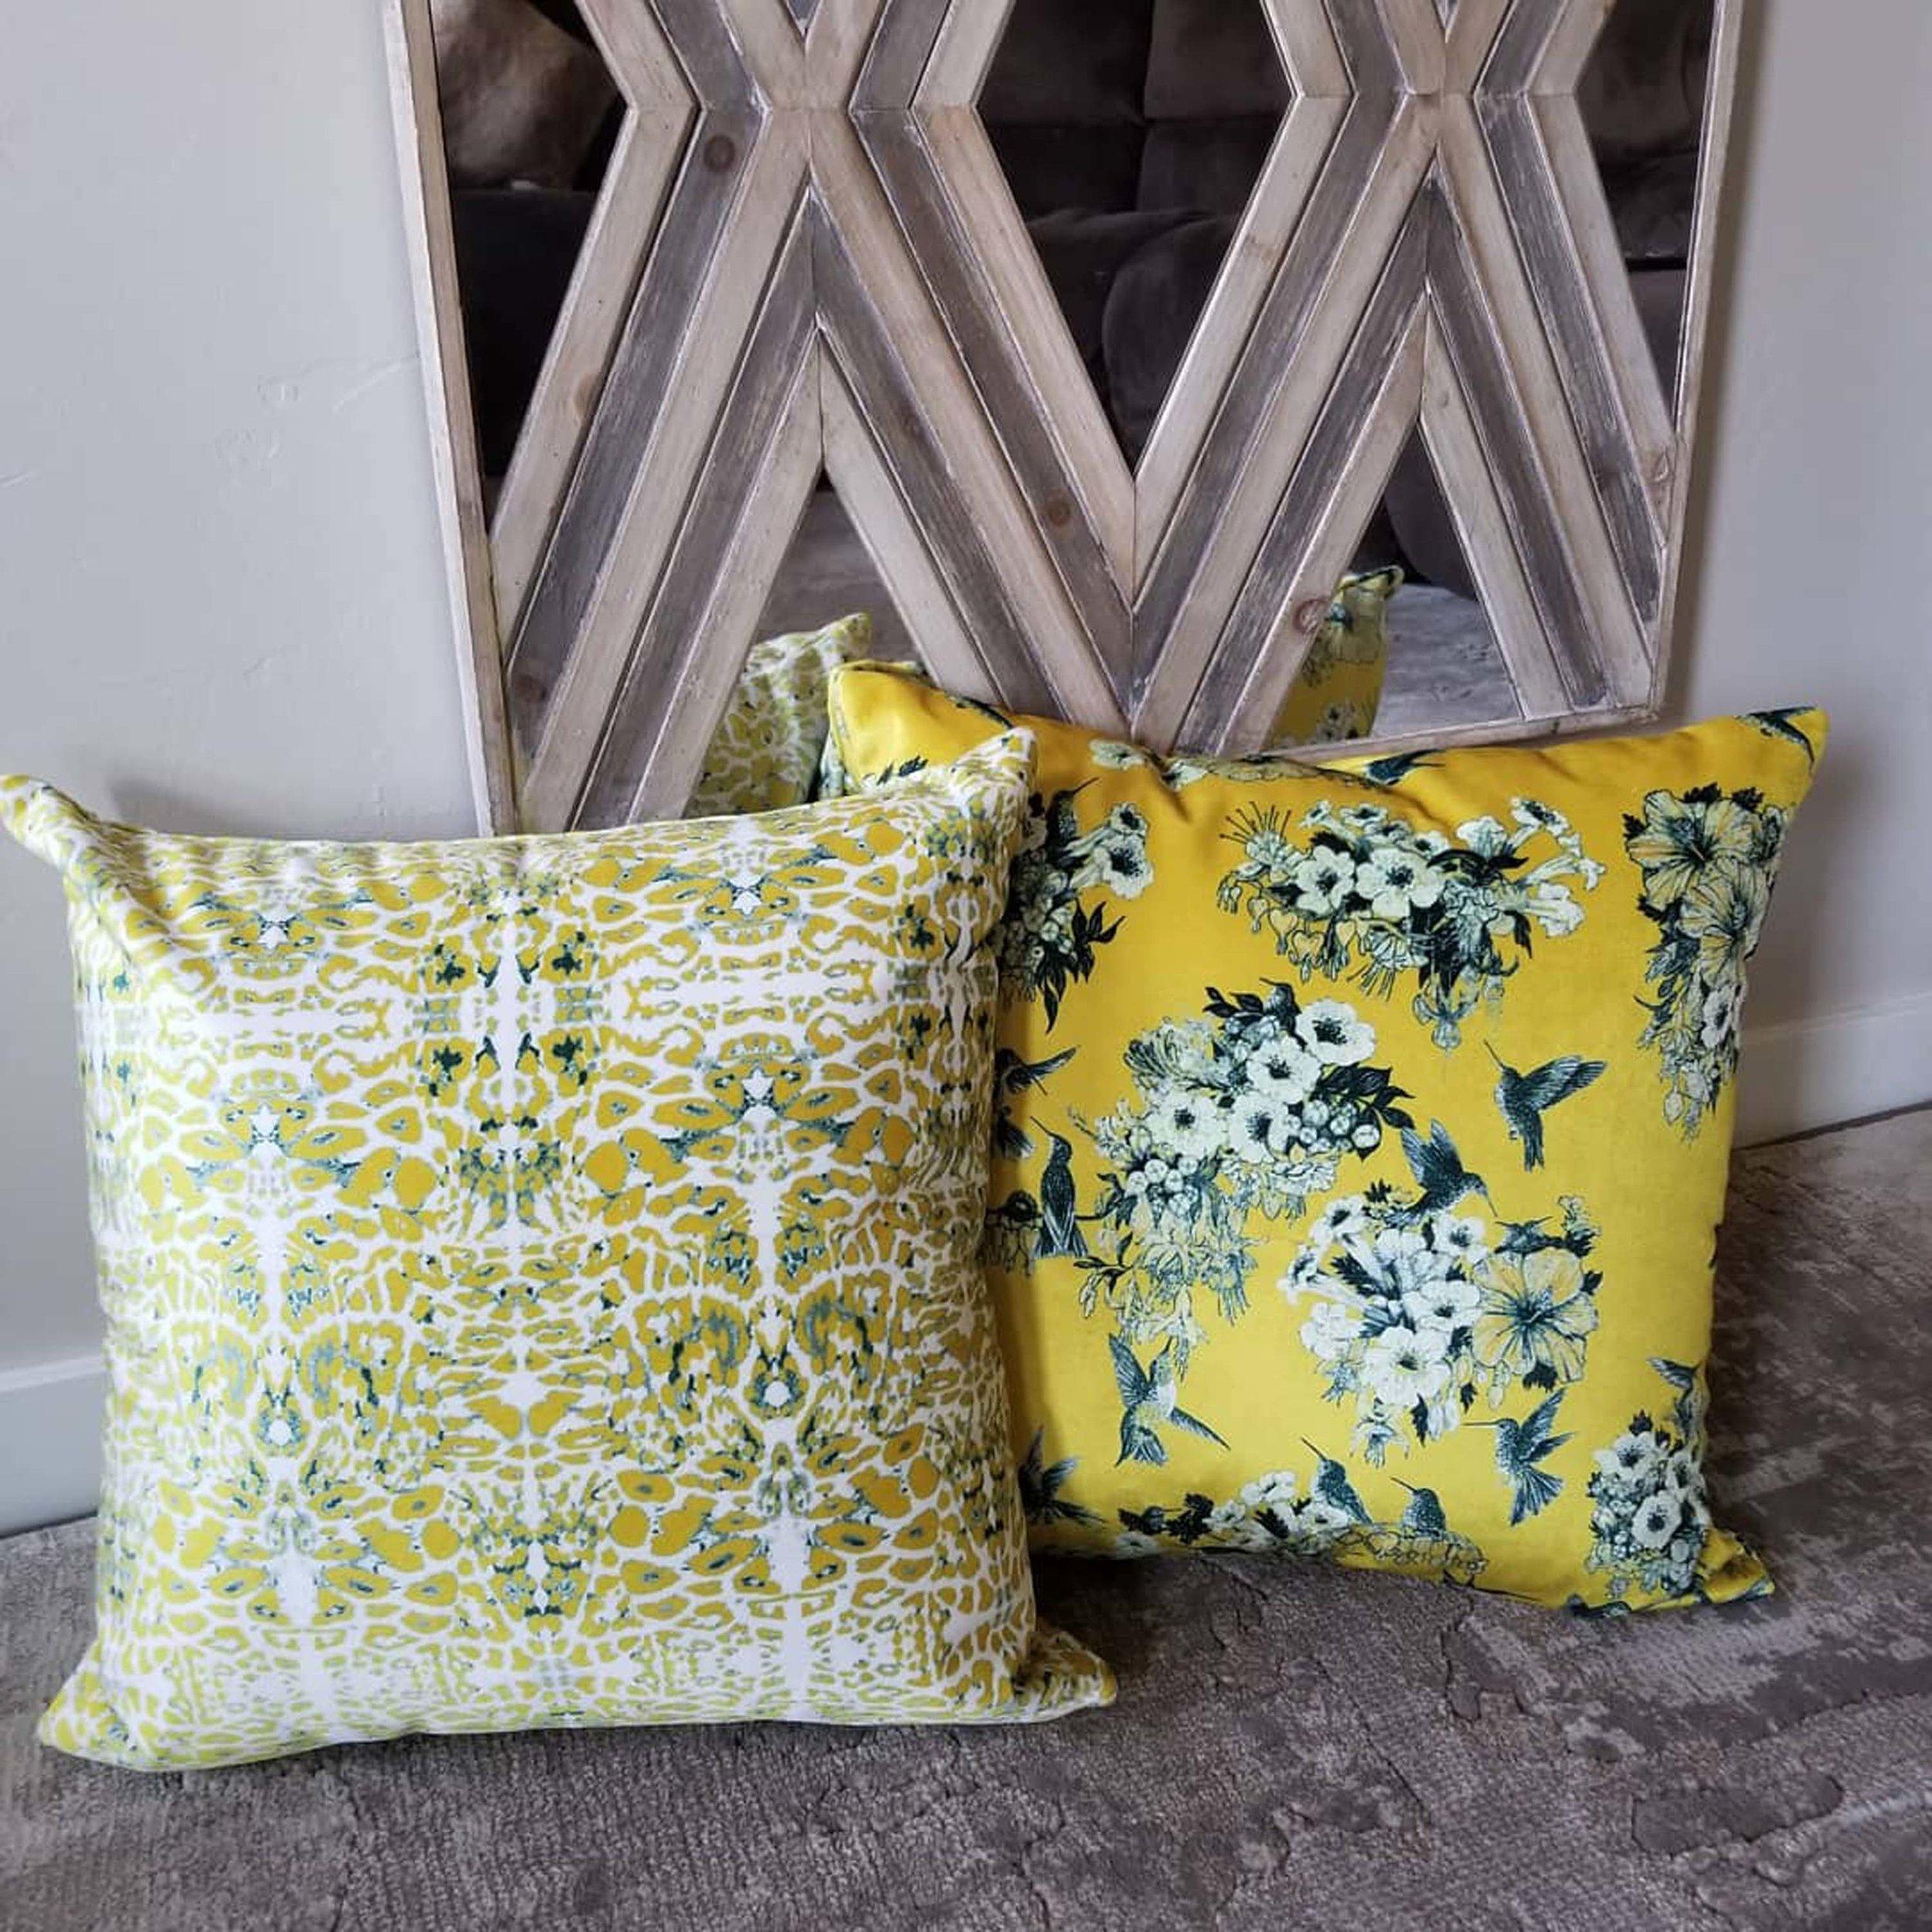 Set of soft yellow pillows